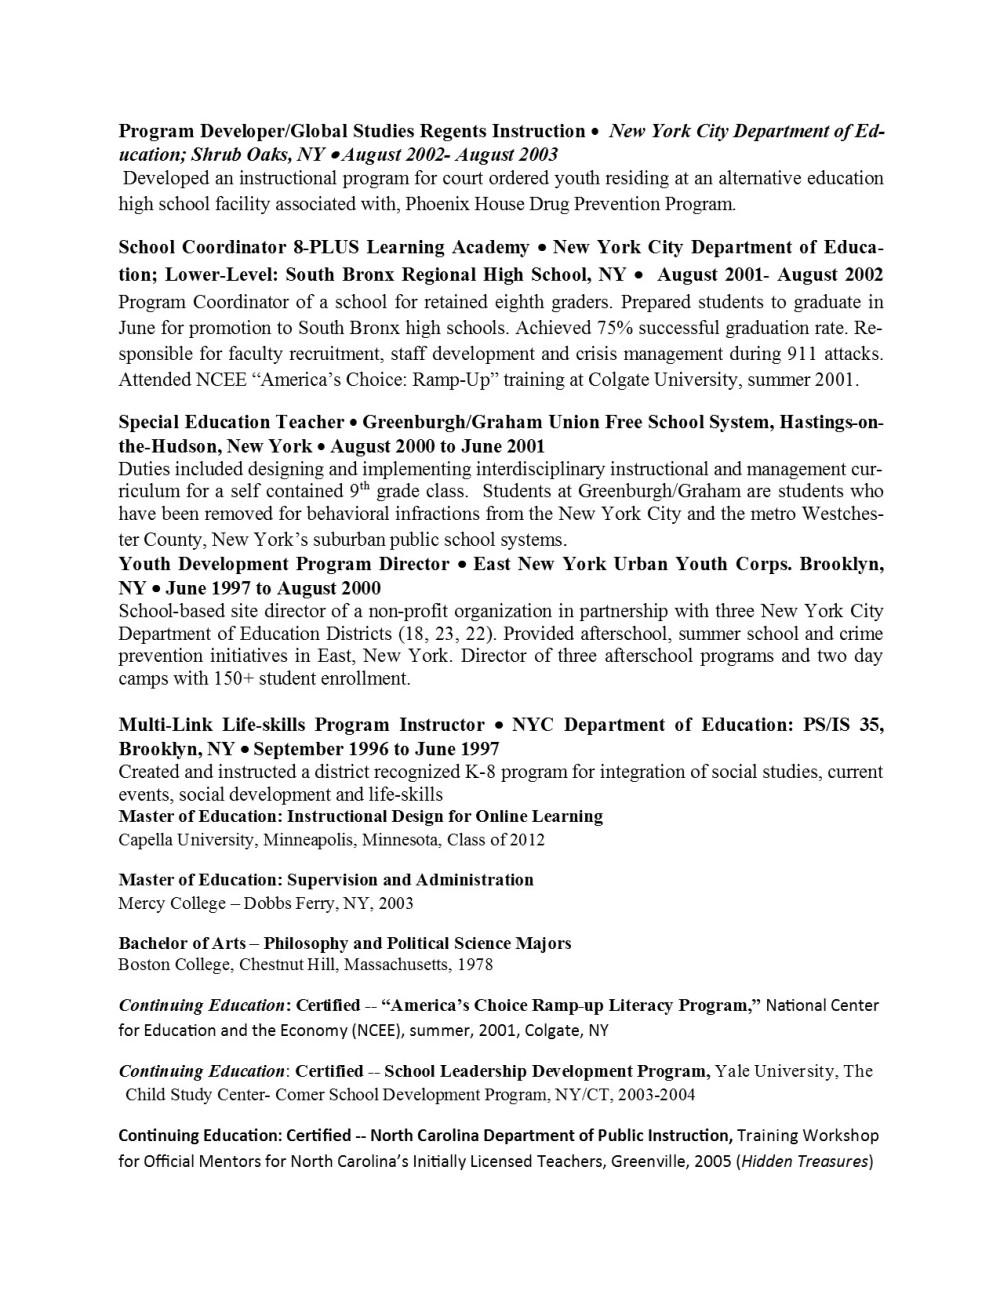 W. Calvin Anderson, M.Ed Resume  page 2